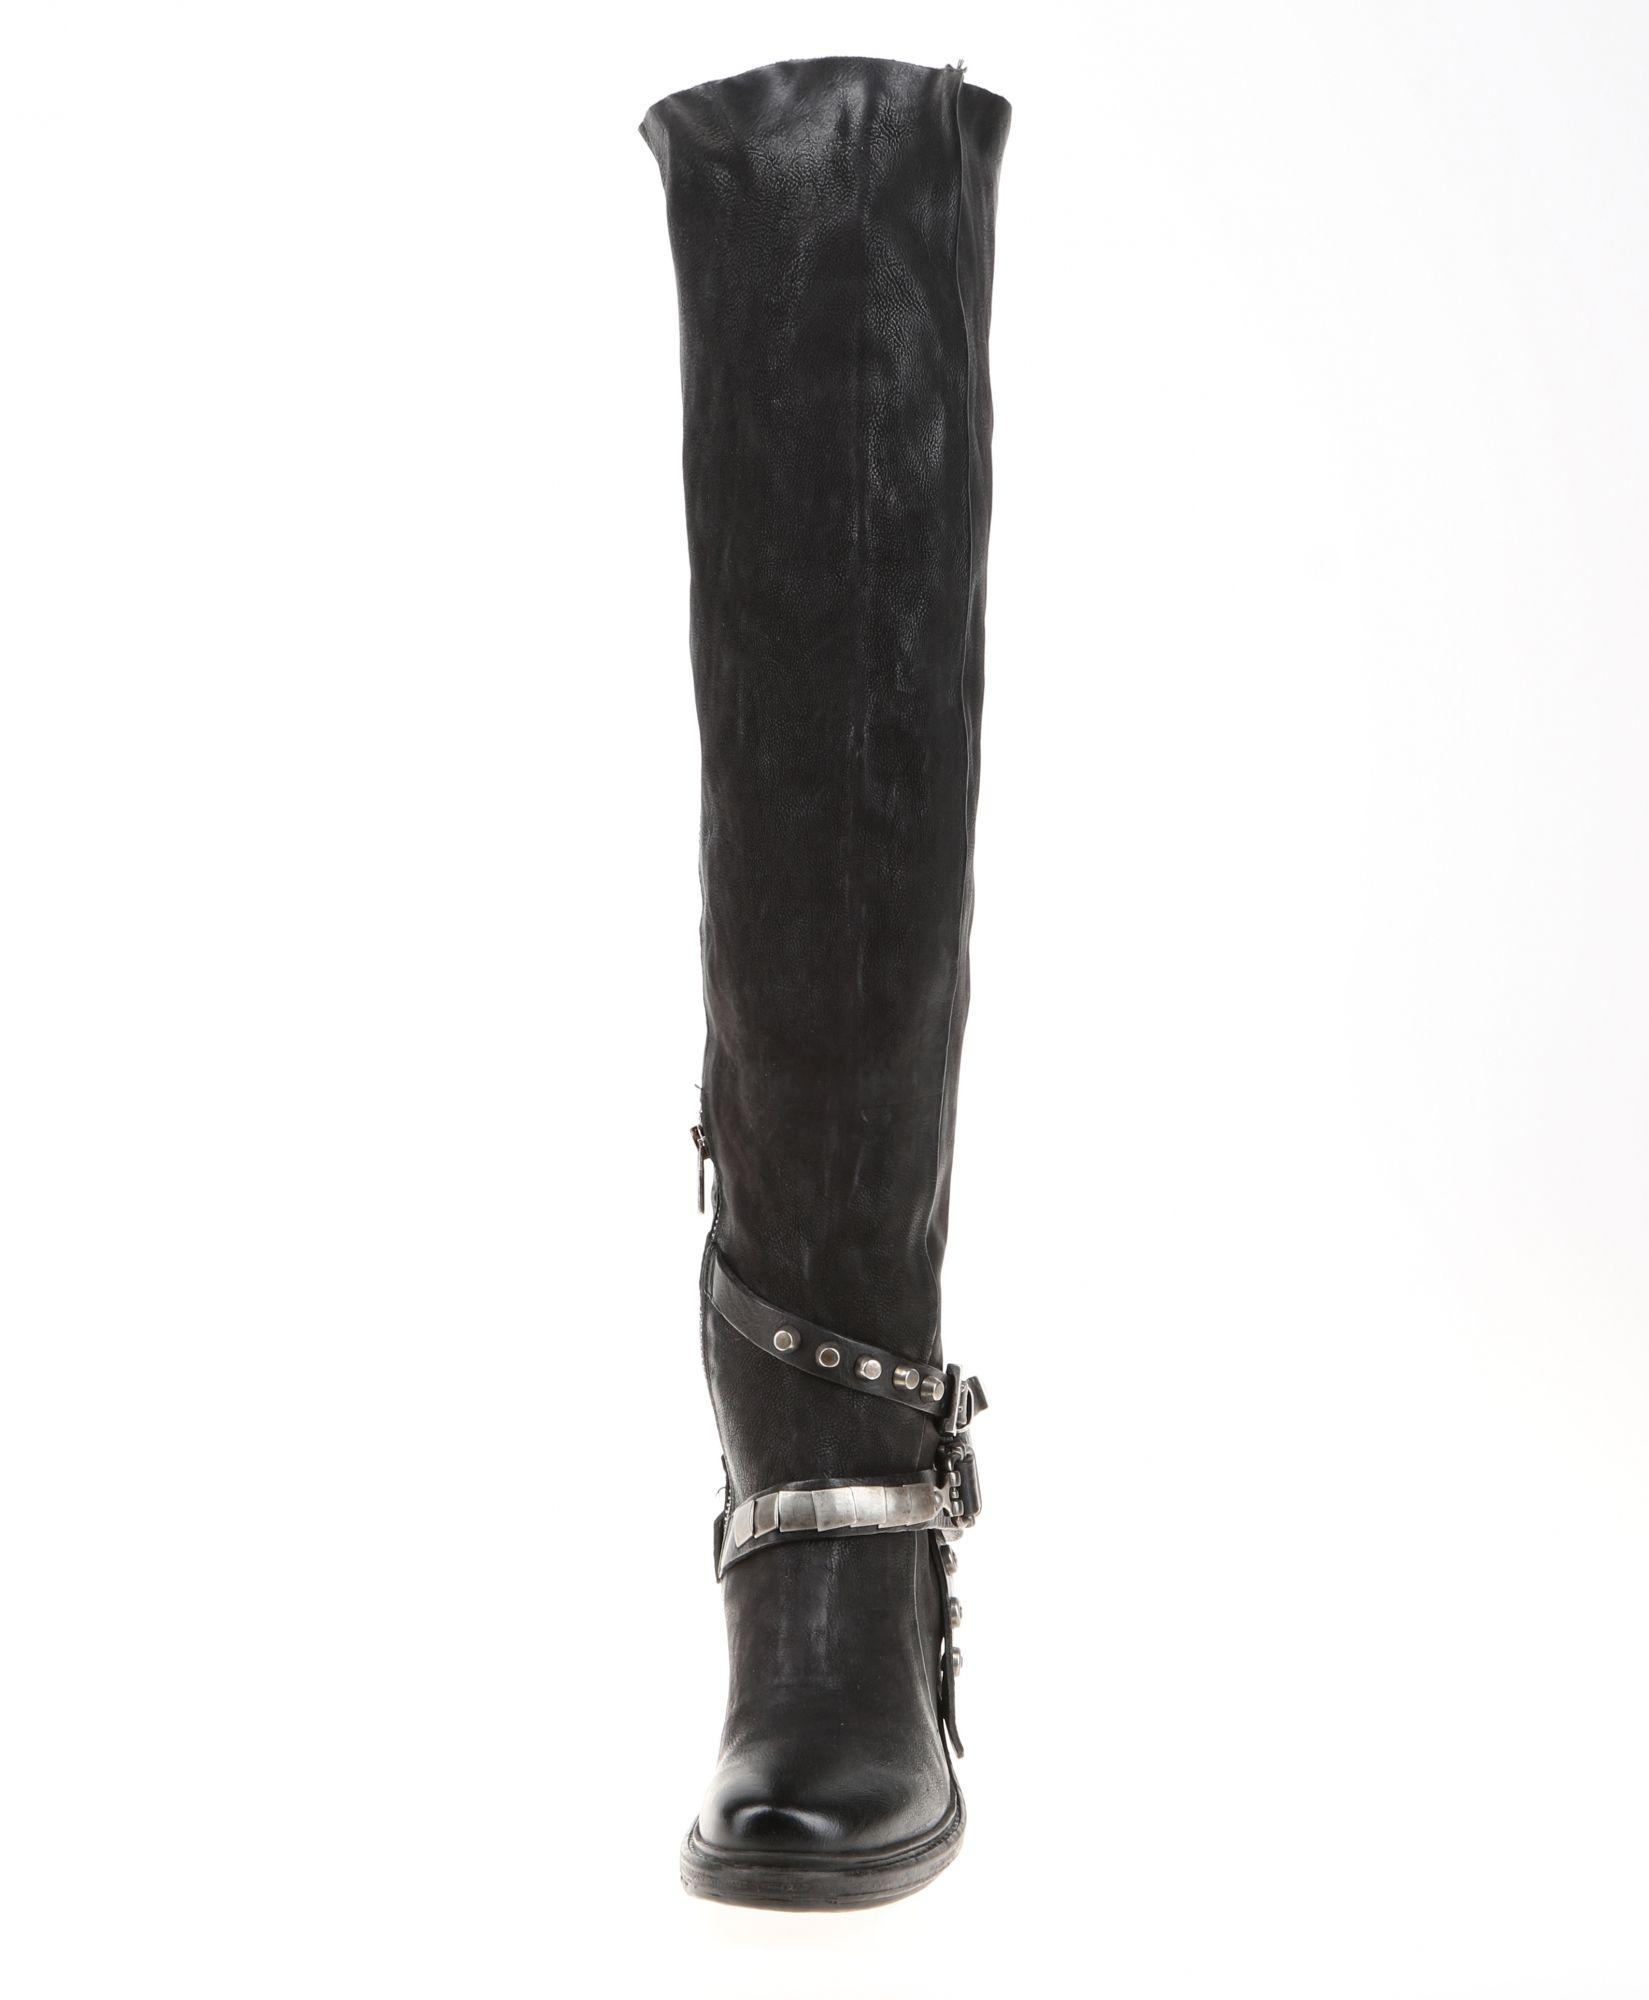 e4049913e0723 Journee Collection Women s  Bite  Regular and Wide-calf Buckle Knee-high  Riding Boot (Black - 6 Medium Width Medium Calf) (leather) in 2019